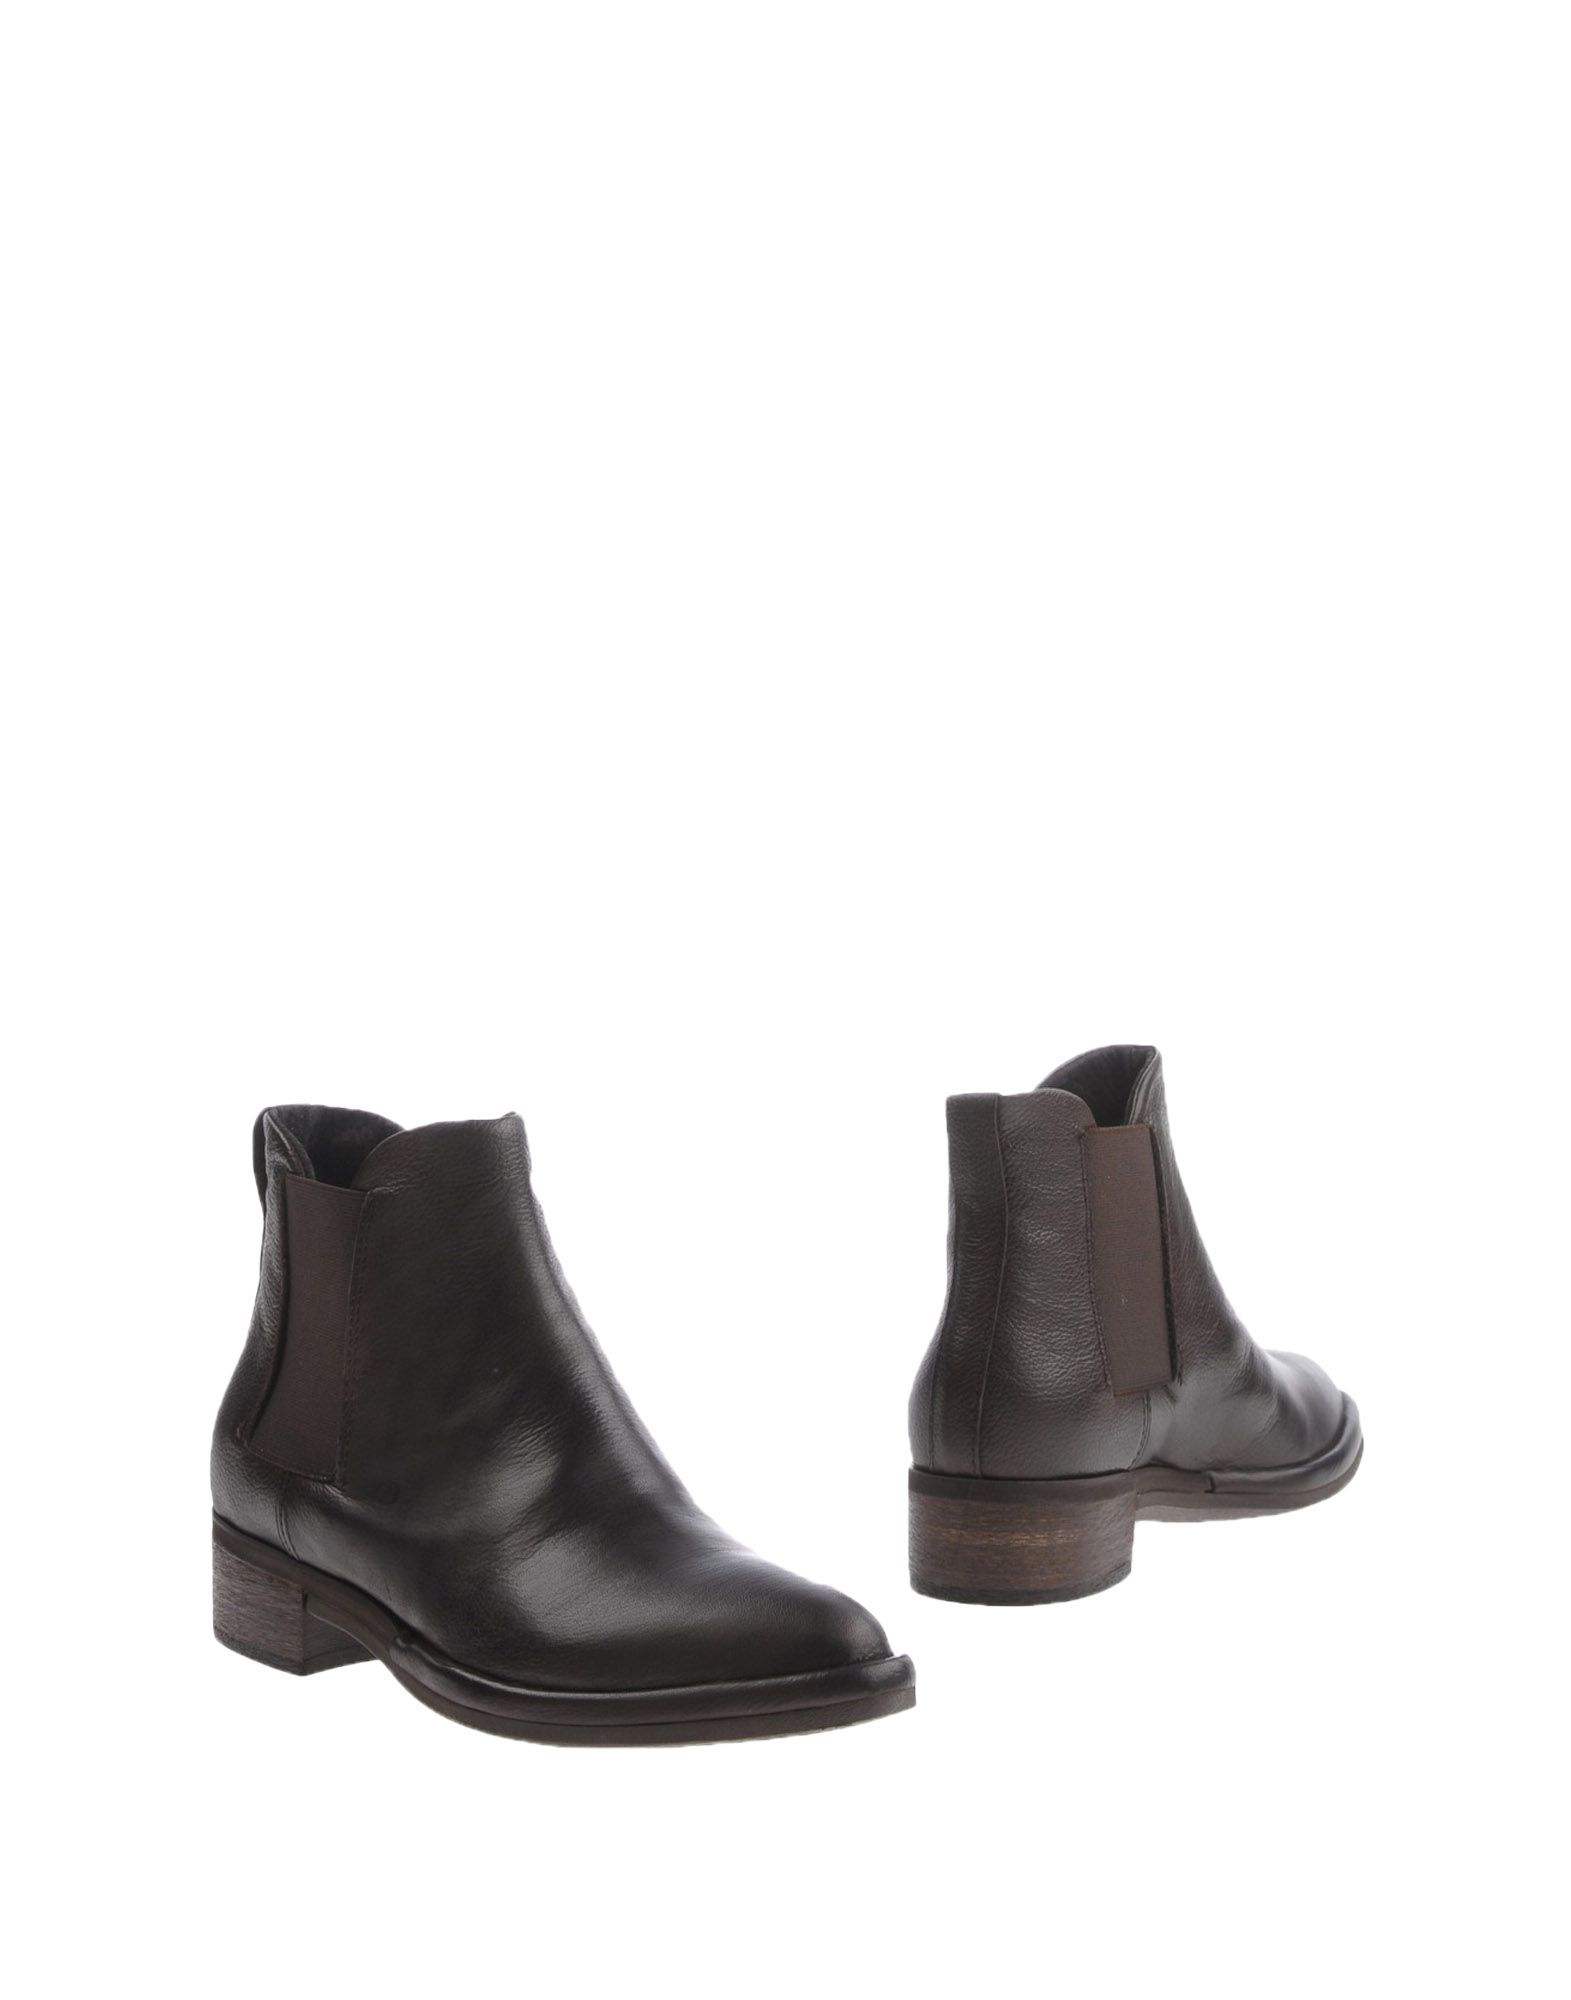 KHRIO' Полусапоги и высокие ботинки magazzini del sale полусапоги и высокие ботинки